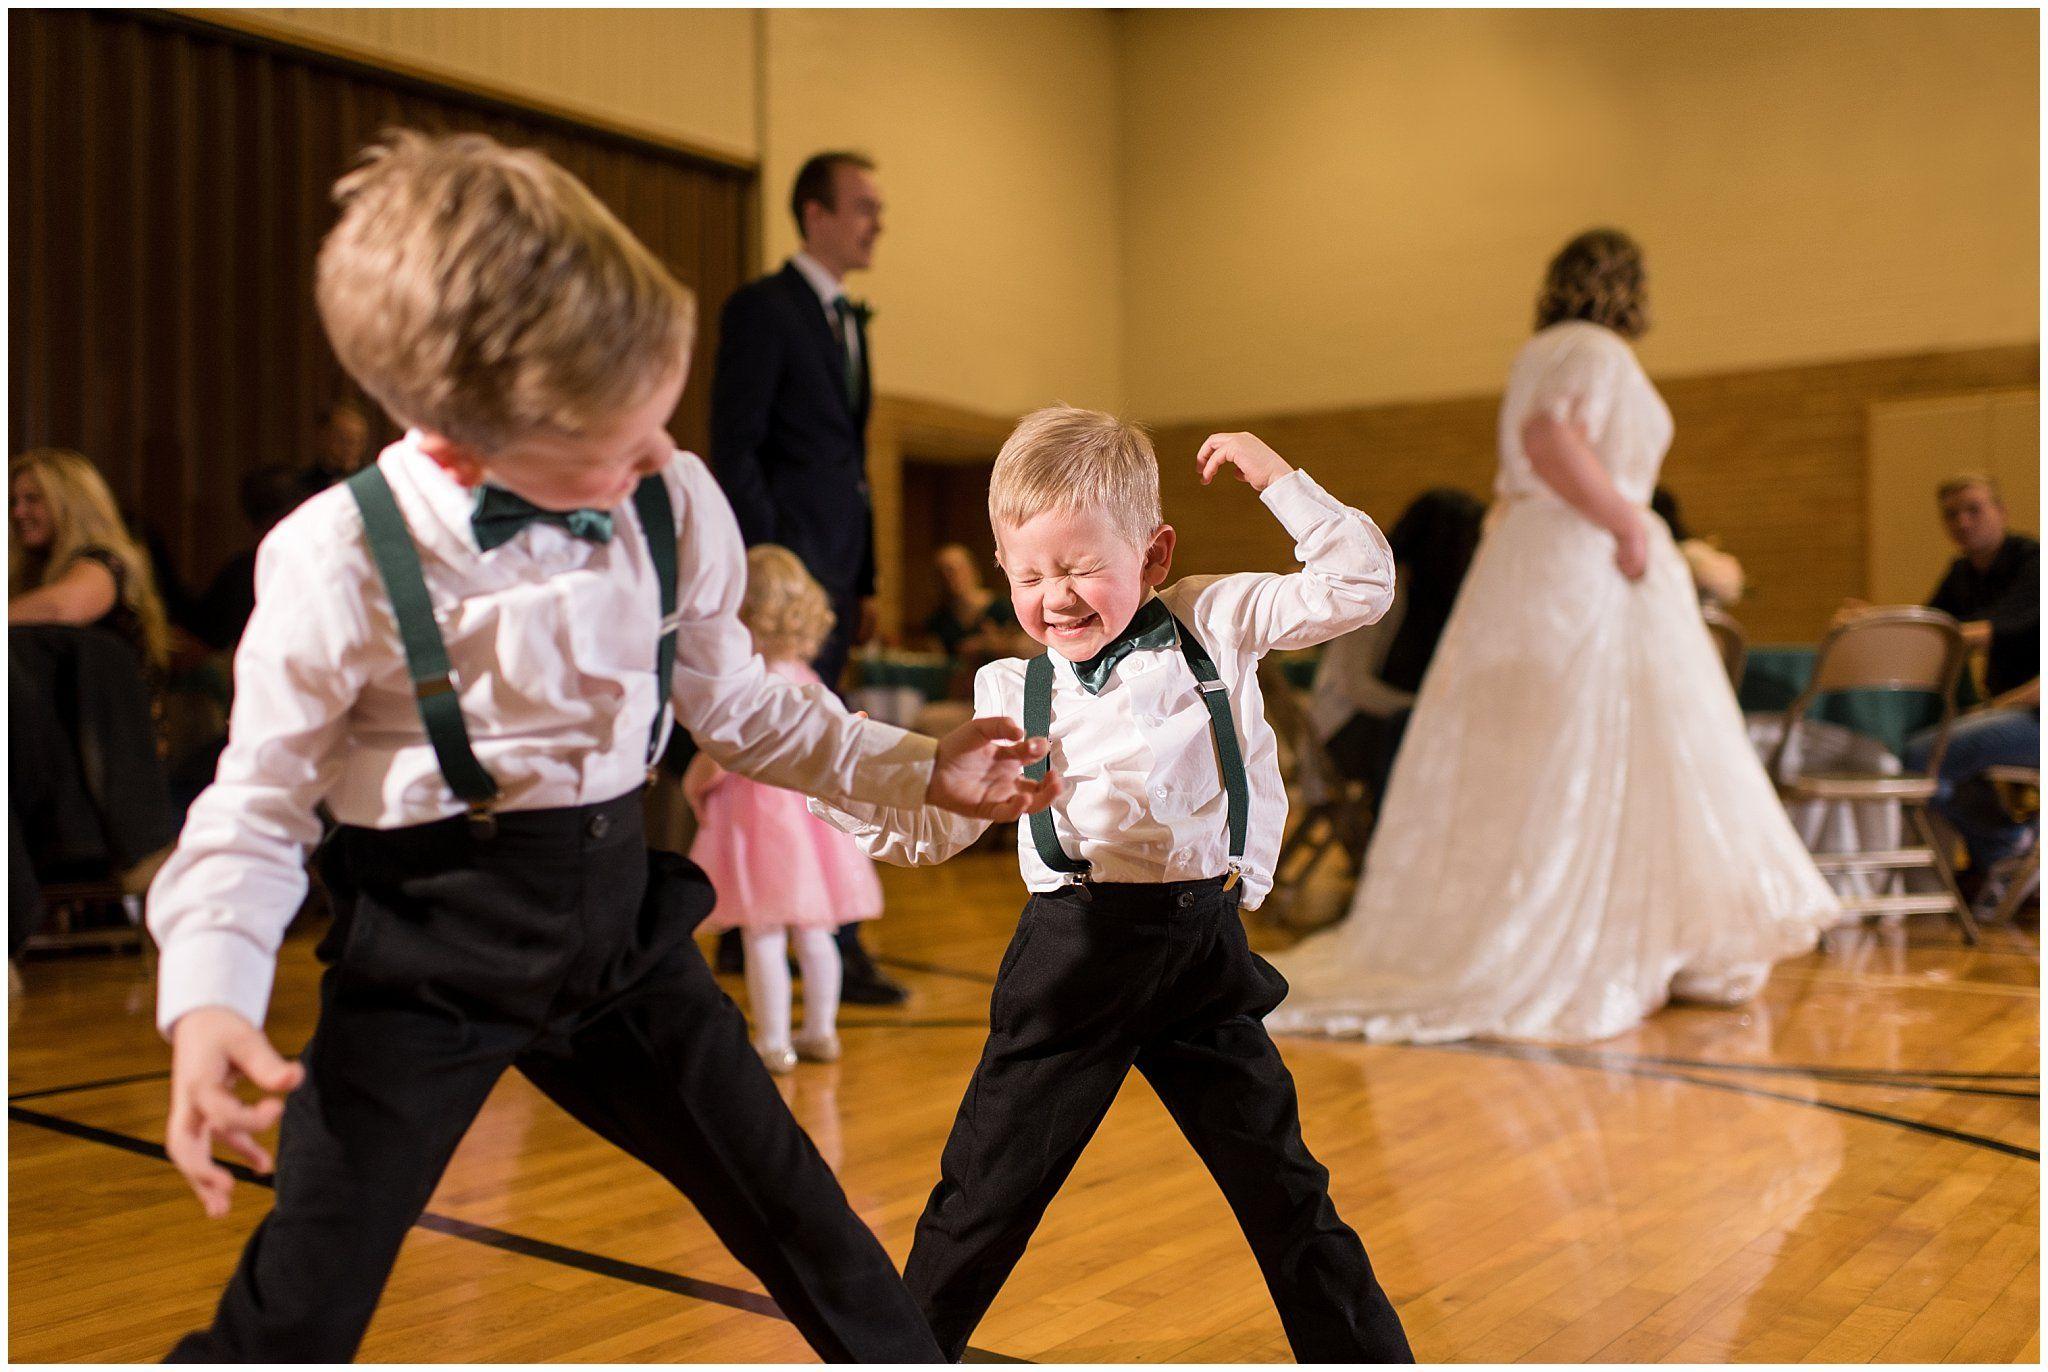 entertain kids at your wedding - ringbearers dancing